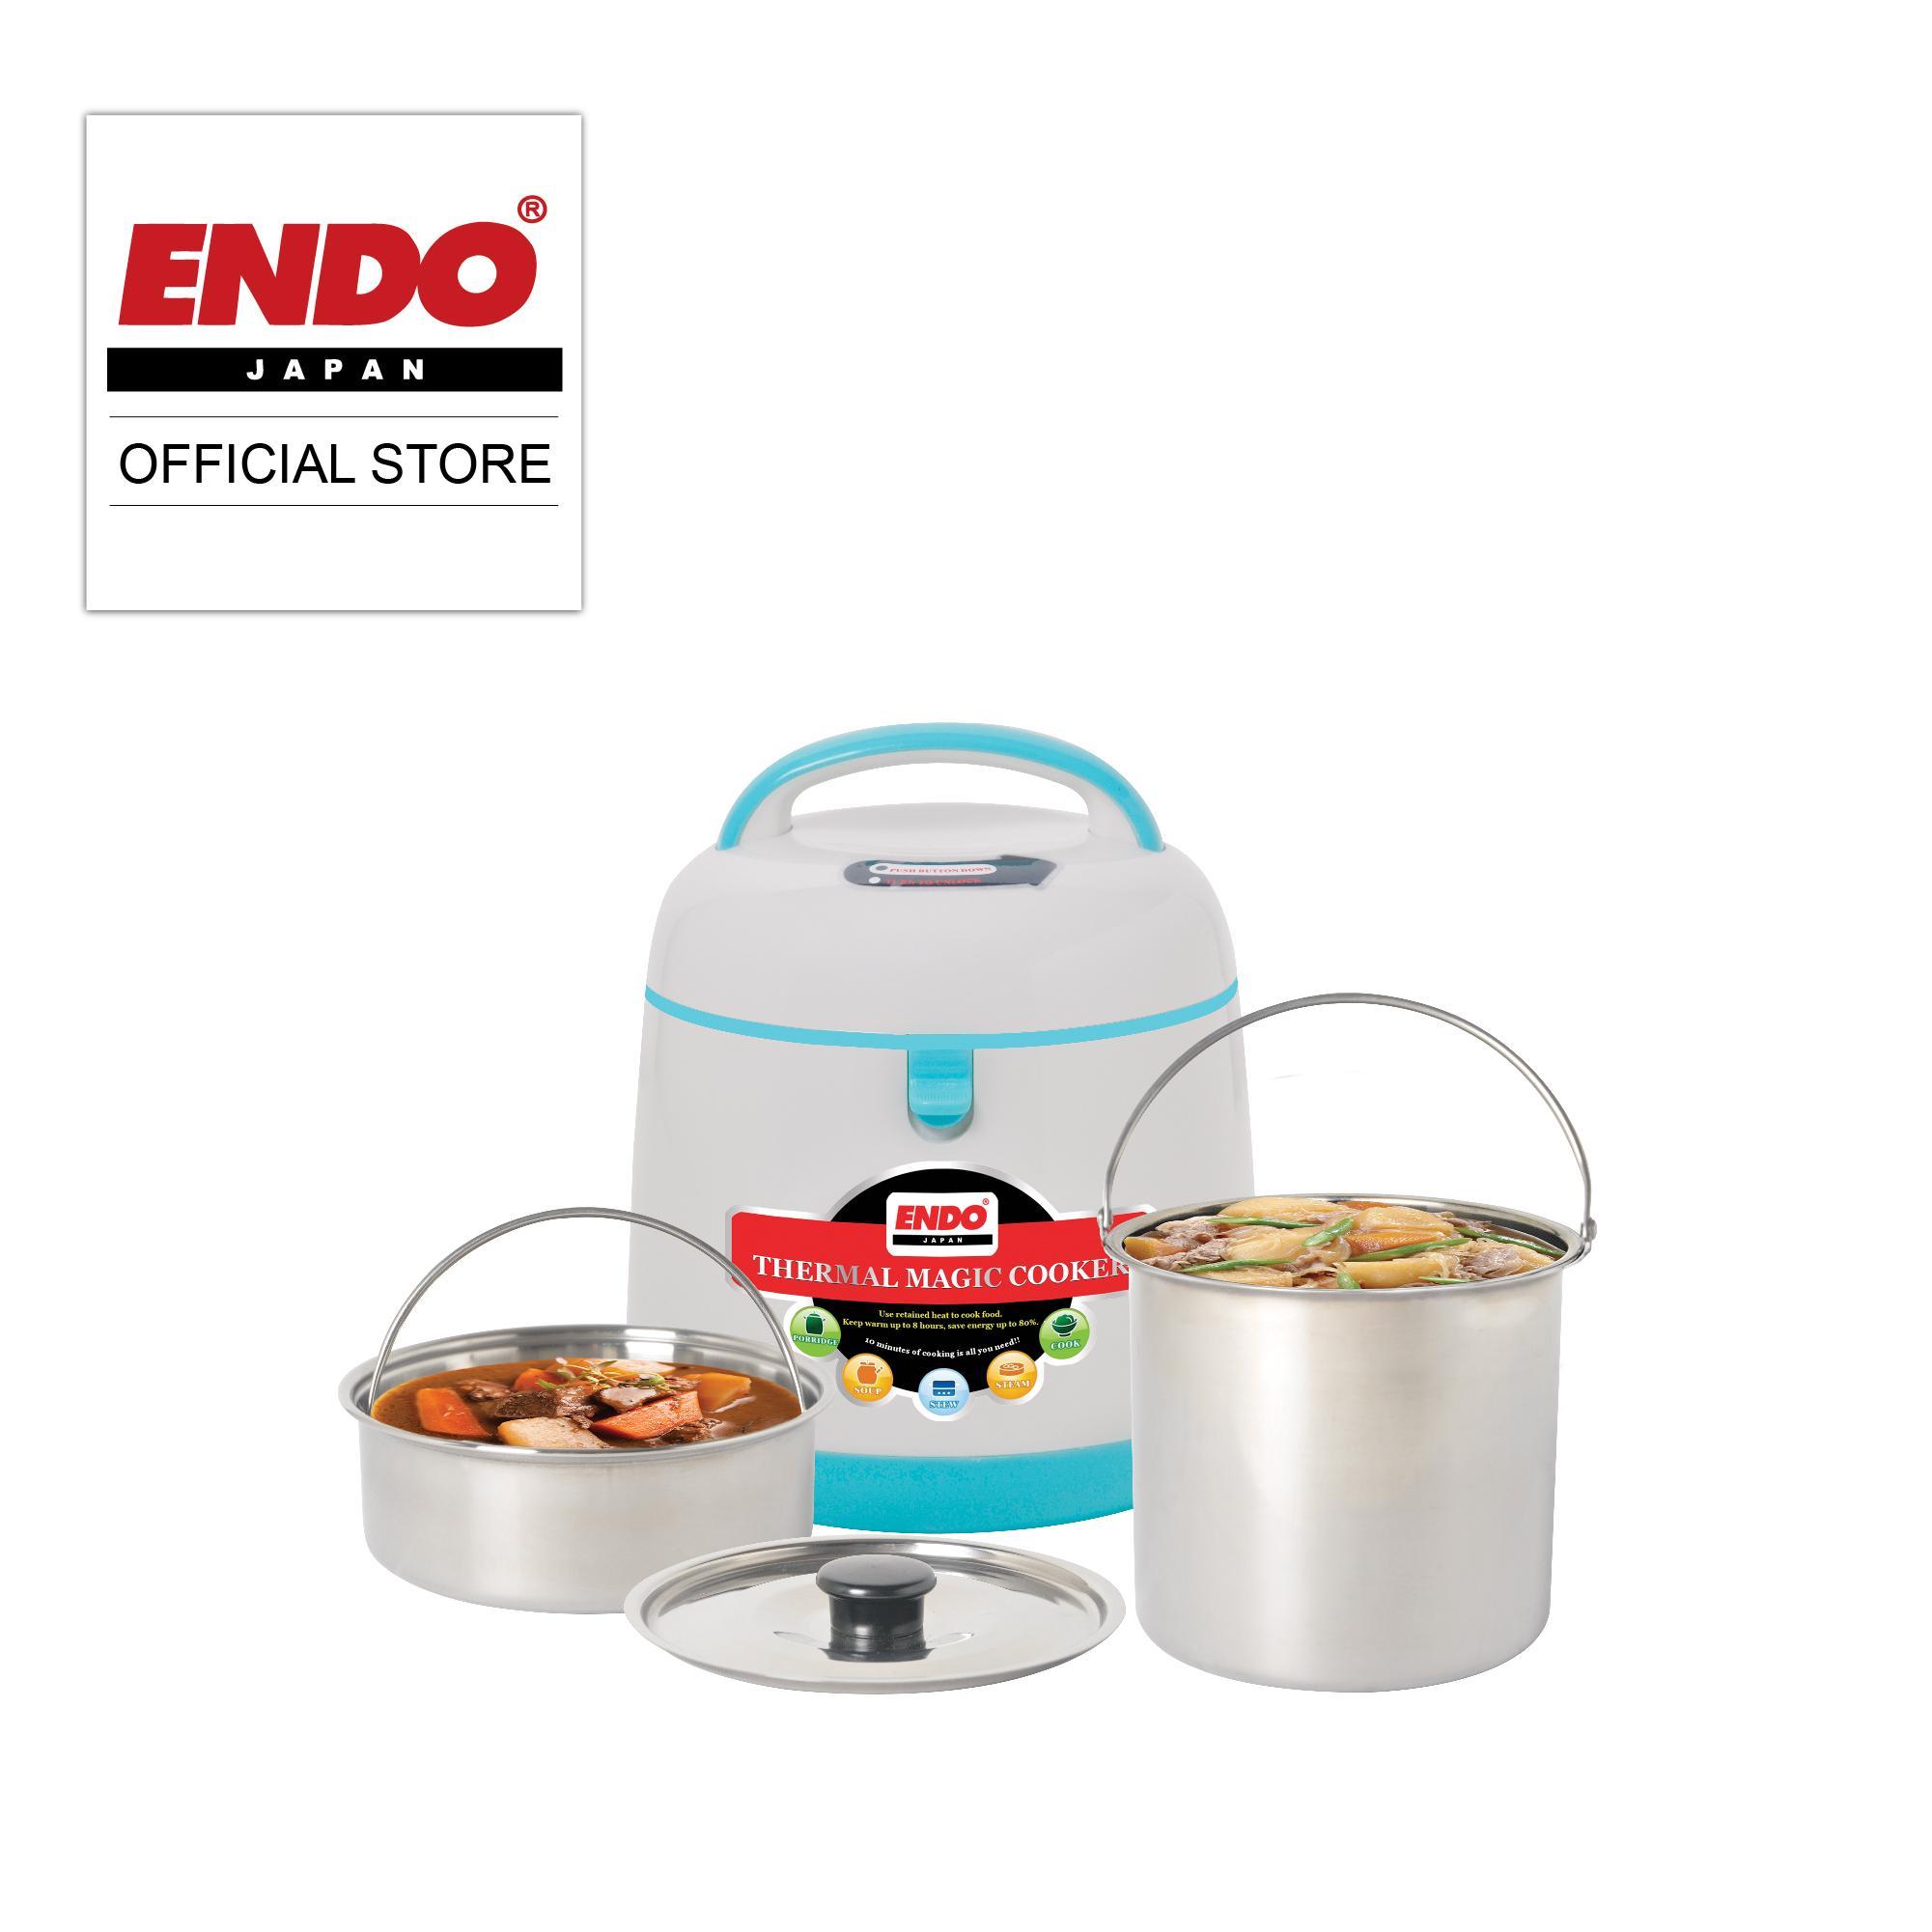 Endo 1.8l Thermal Magic Cooker - E-Tmc1.8 By Heap Seng Group.